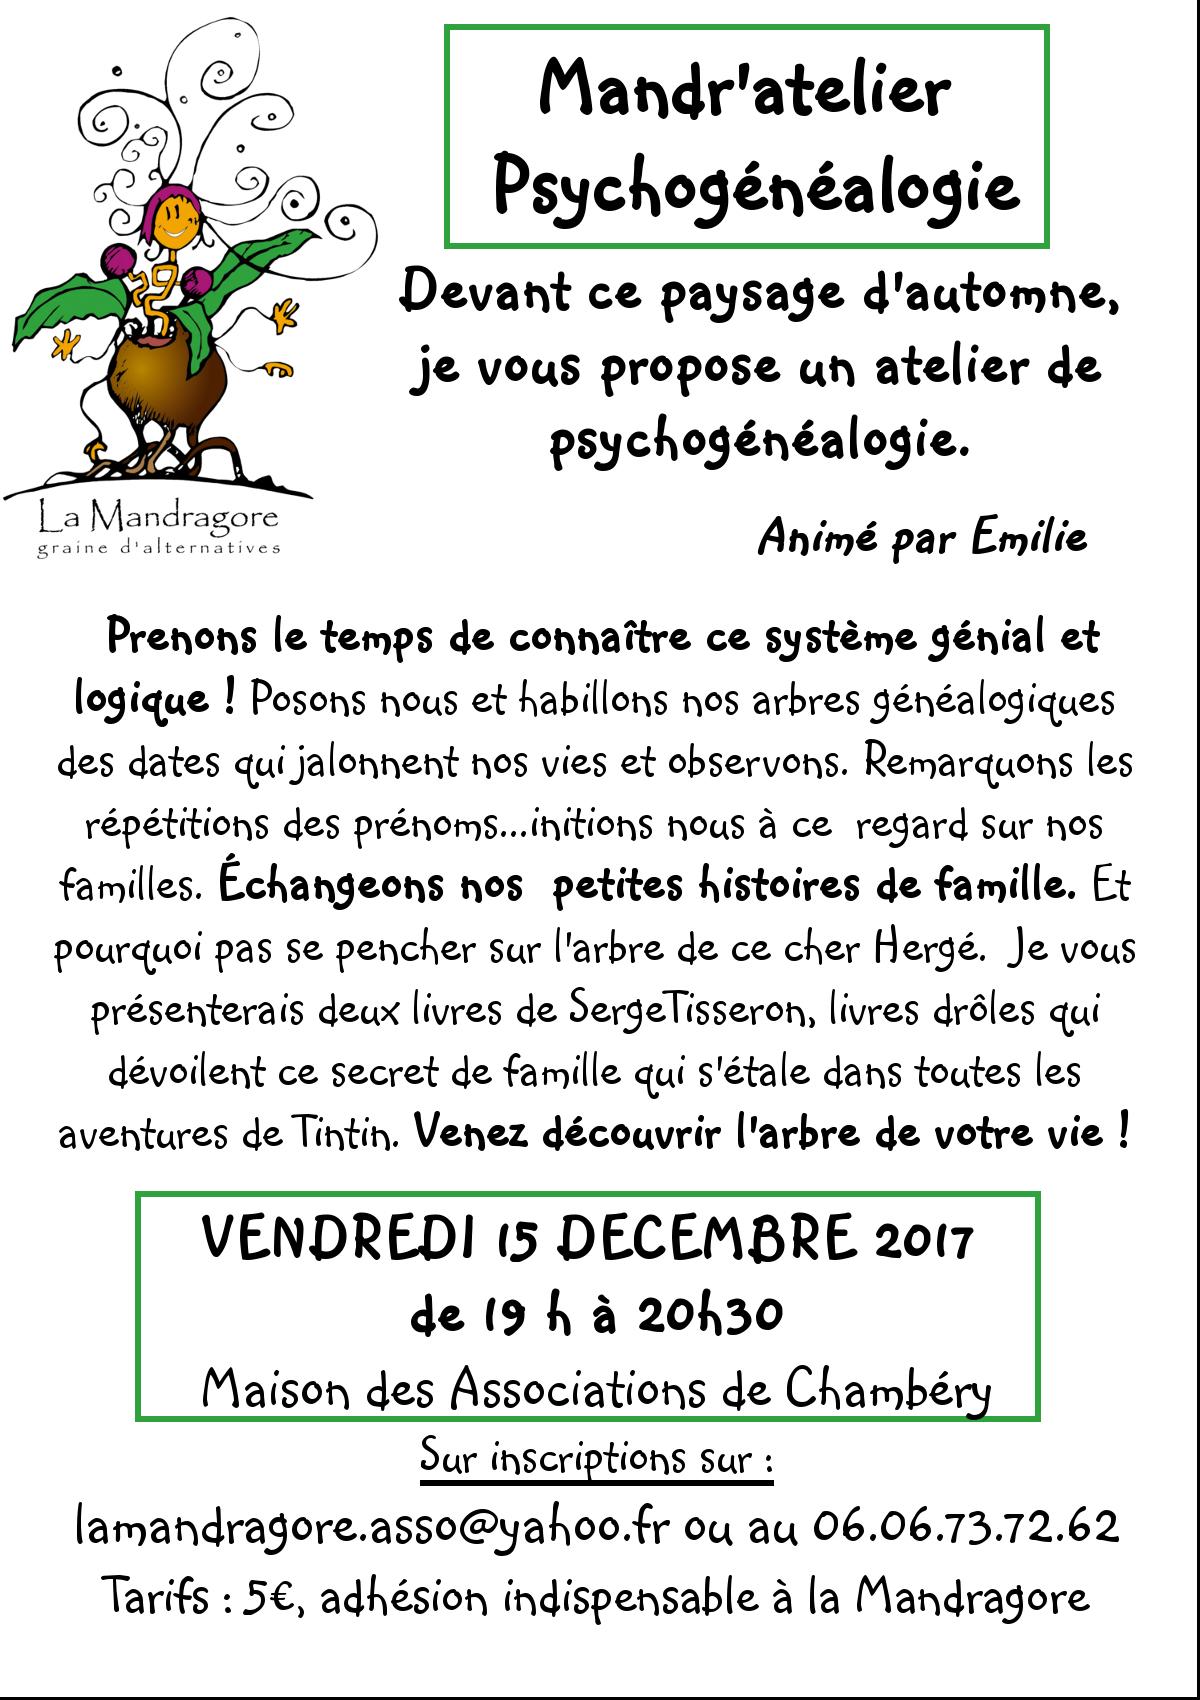 Mandr'atelier - Psychogénéalogie 15 12 2017